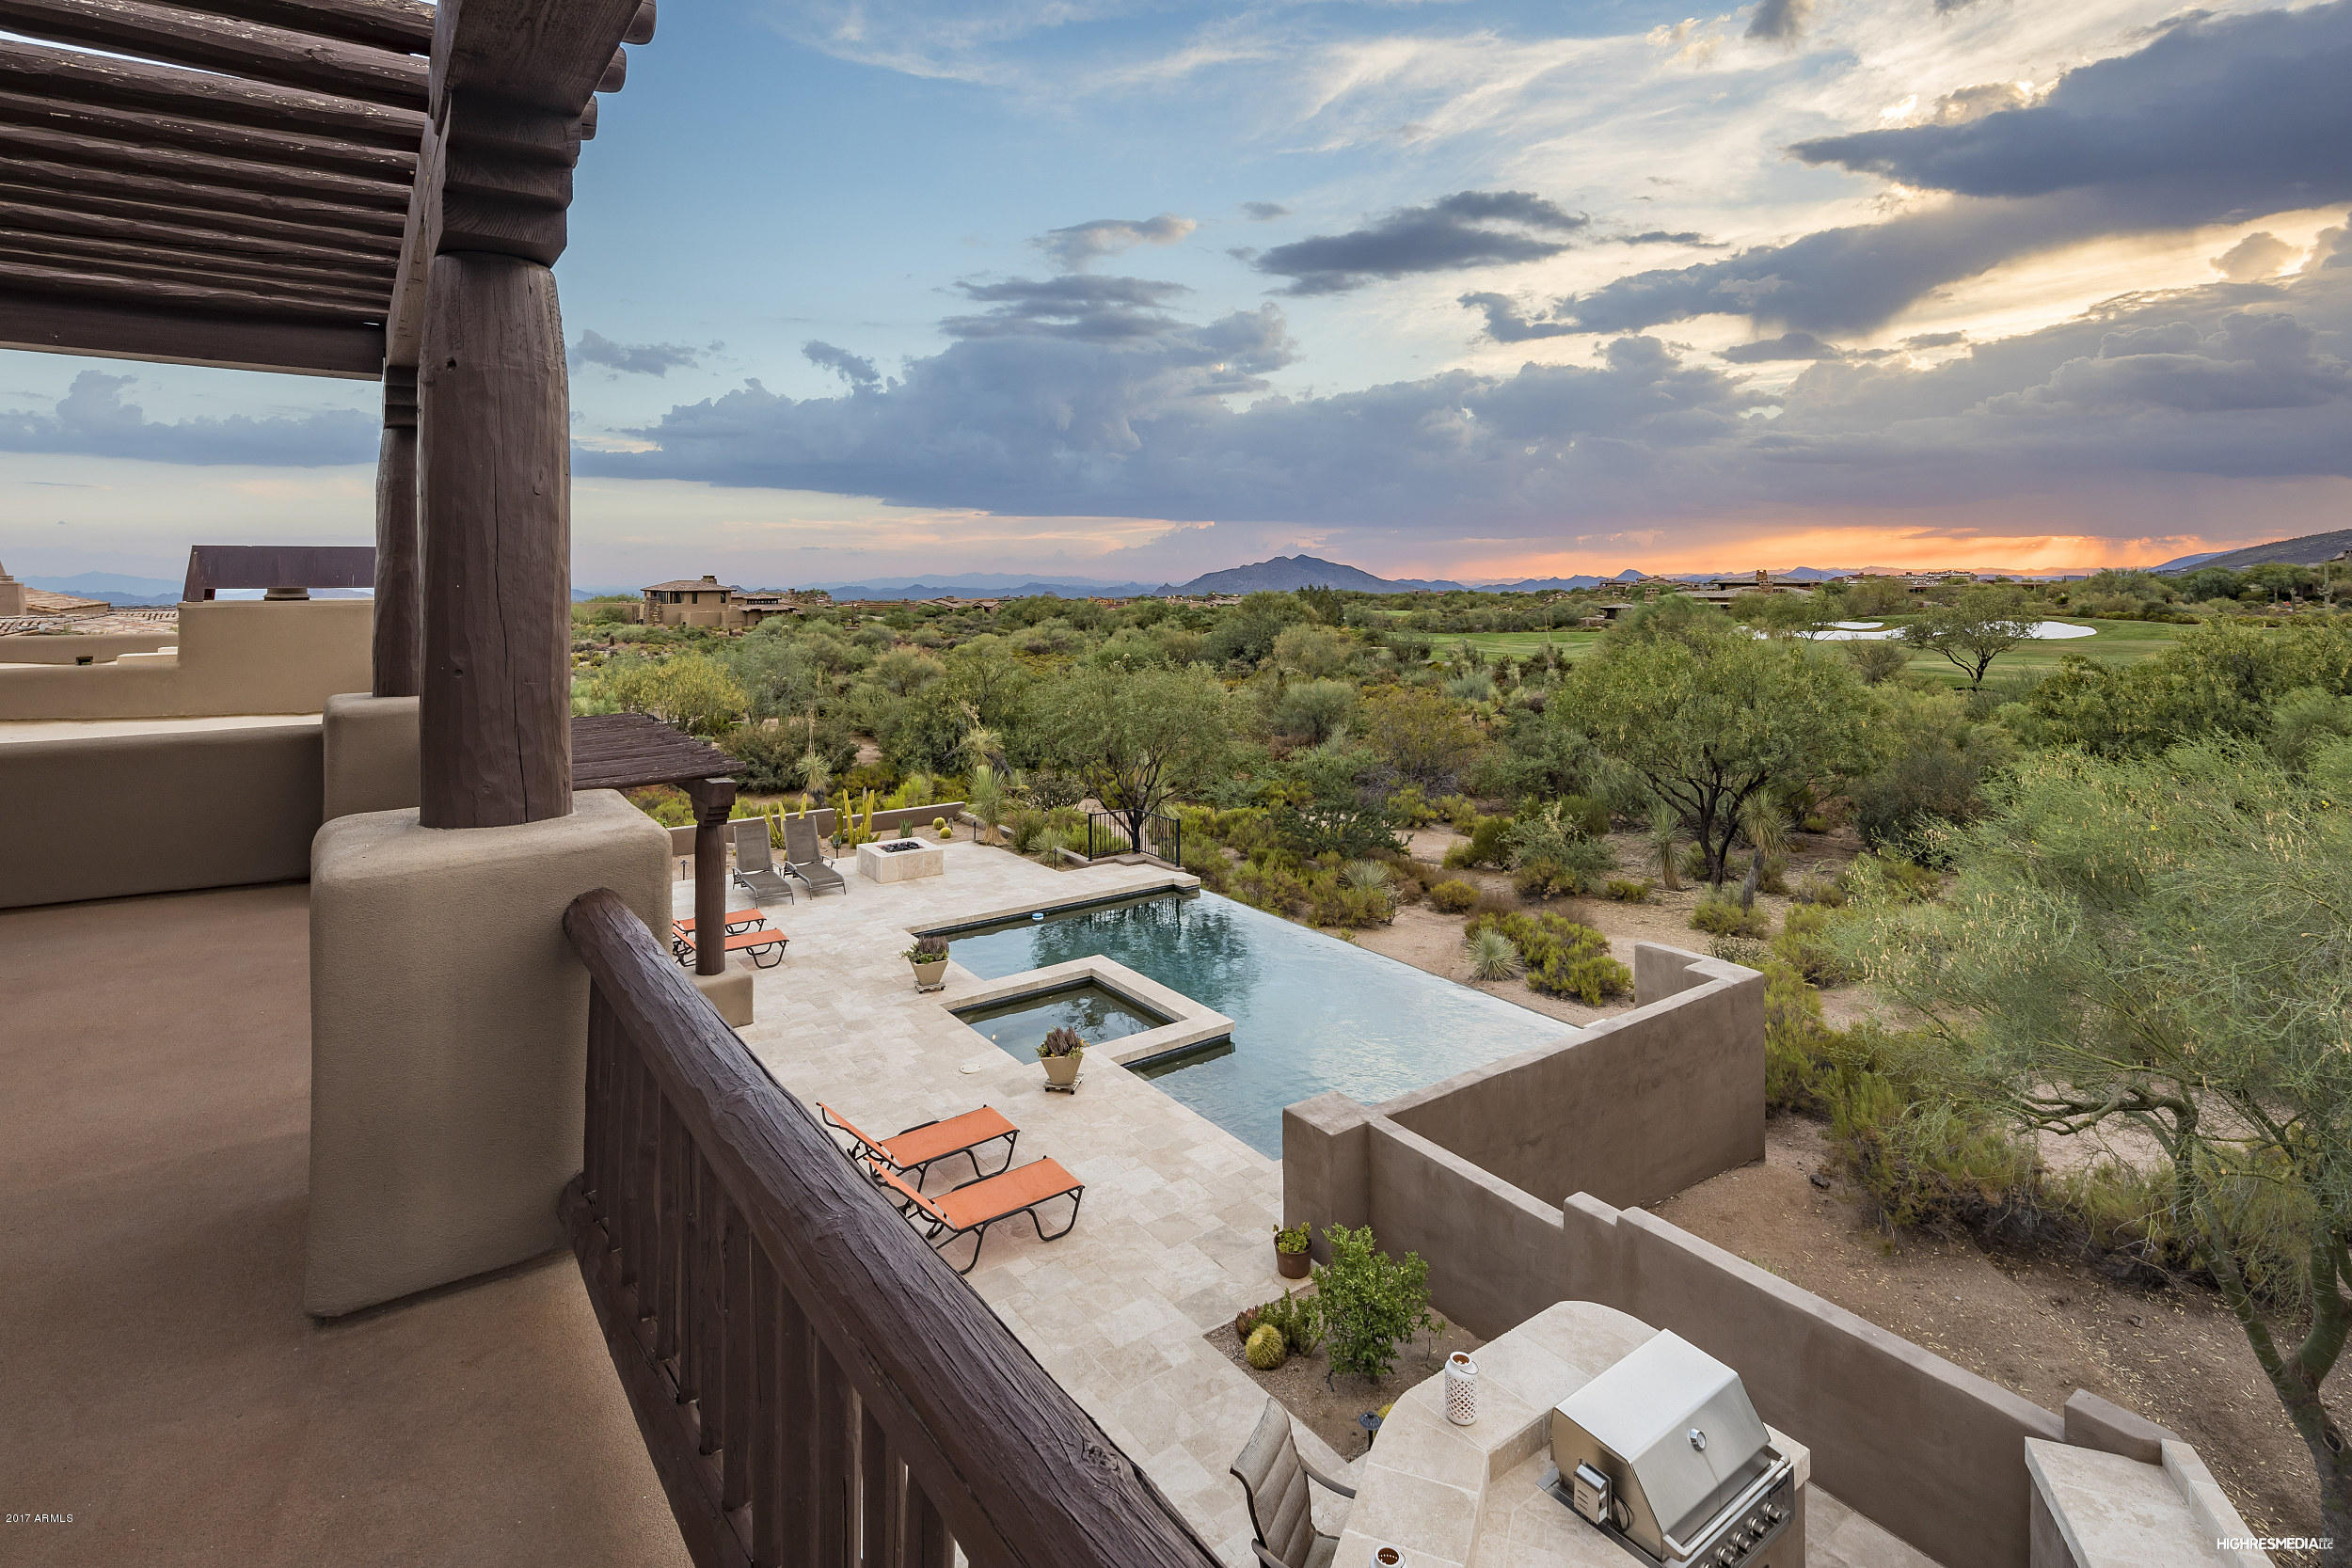 MLS 5656322 10970 E WILDCAT HILL Road, Scottsdale, AZ Scottsdale AZ Mirabel Golf